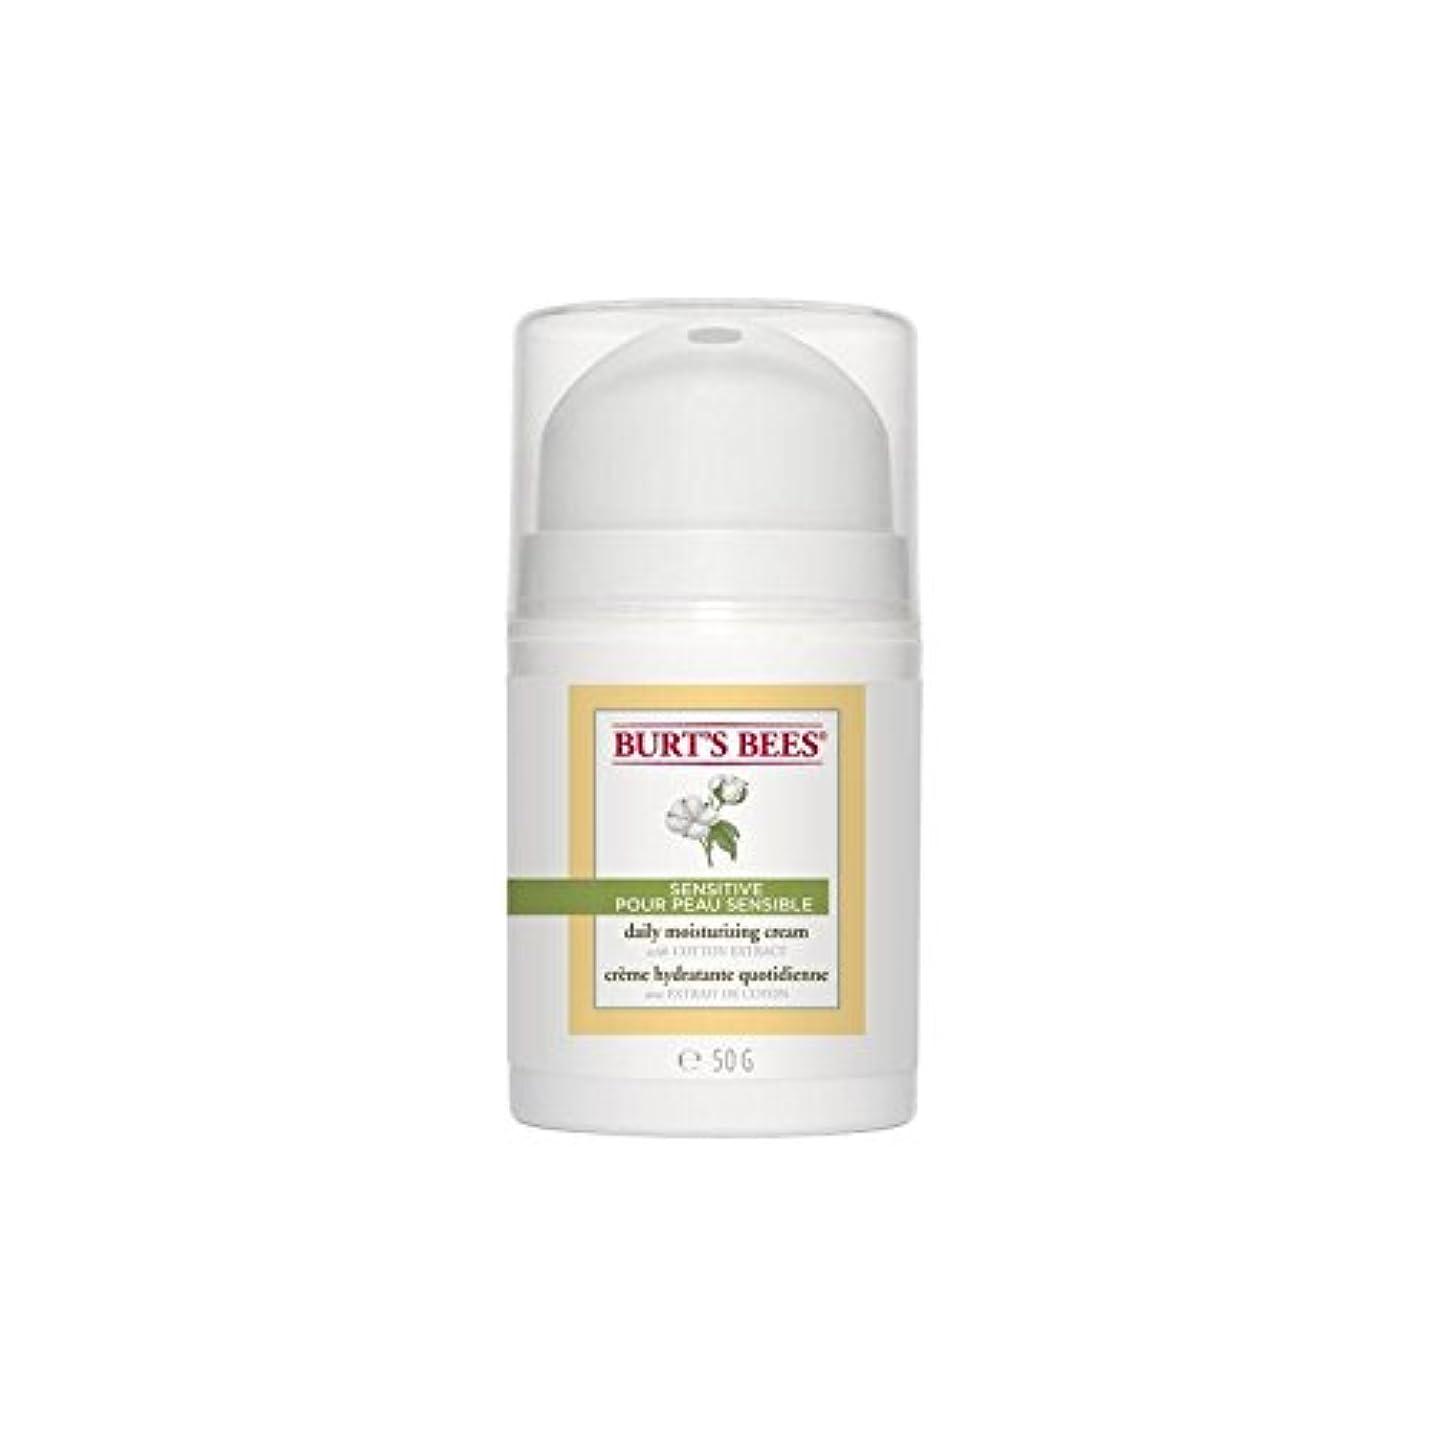 Burt's Bees Sensitive Daily Moisturising Cream 50G - バーツビー敏感毎日保湿クリーム50グラム [並行輸入品]